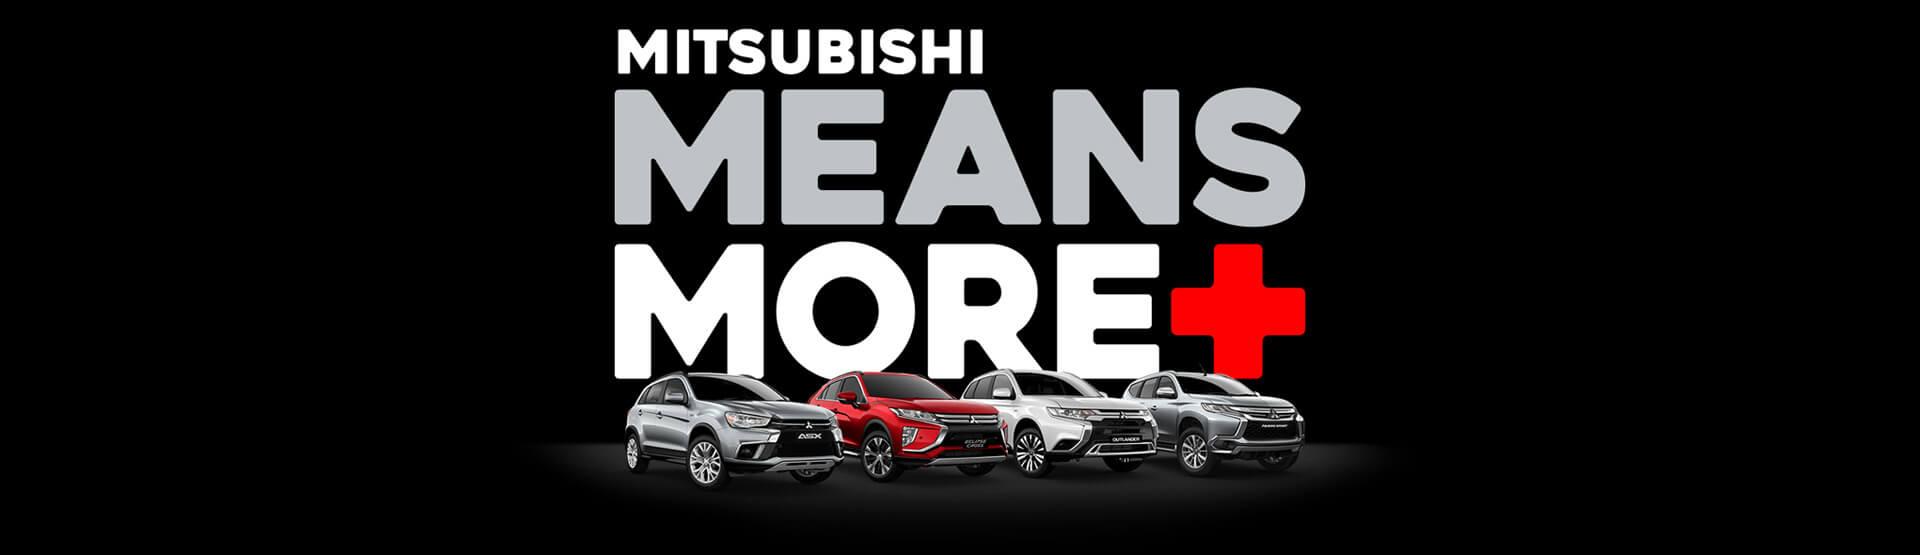 Mitsubishi Offers - April 2019